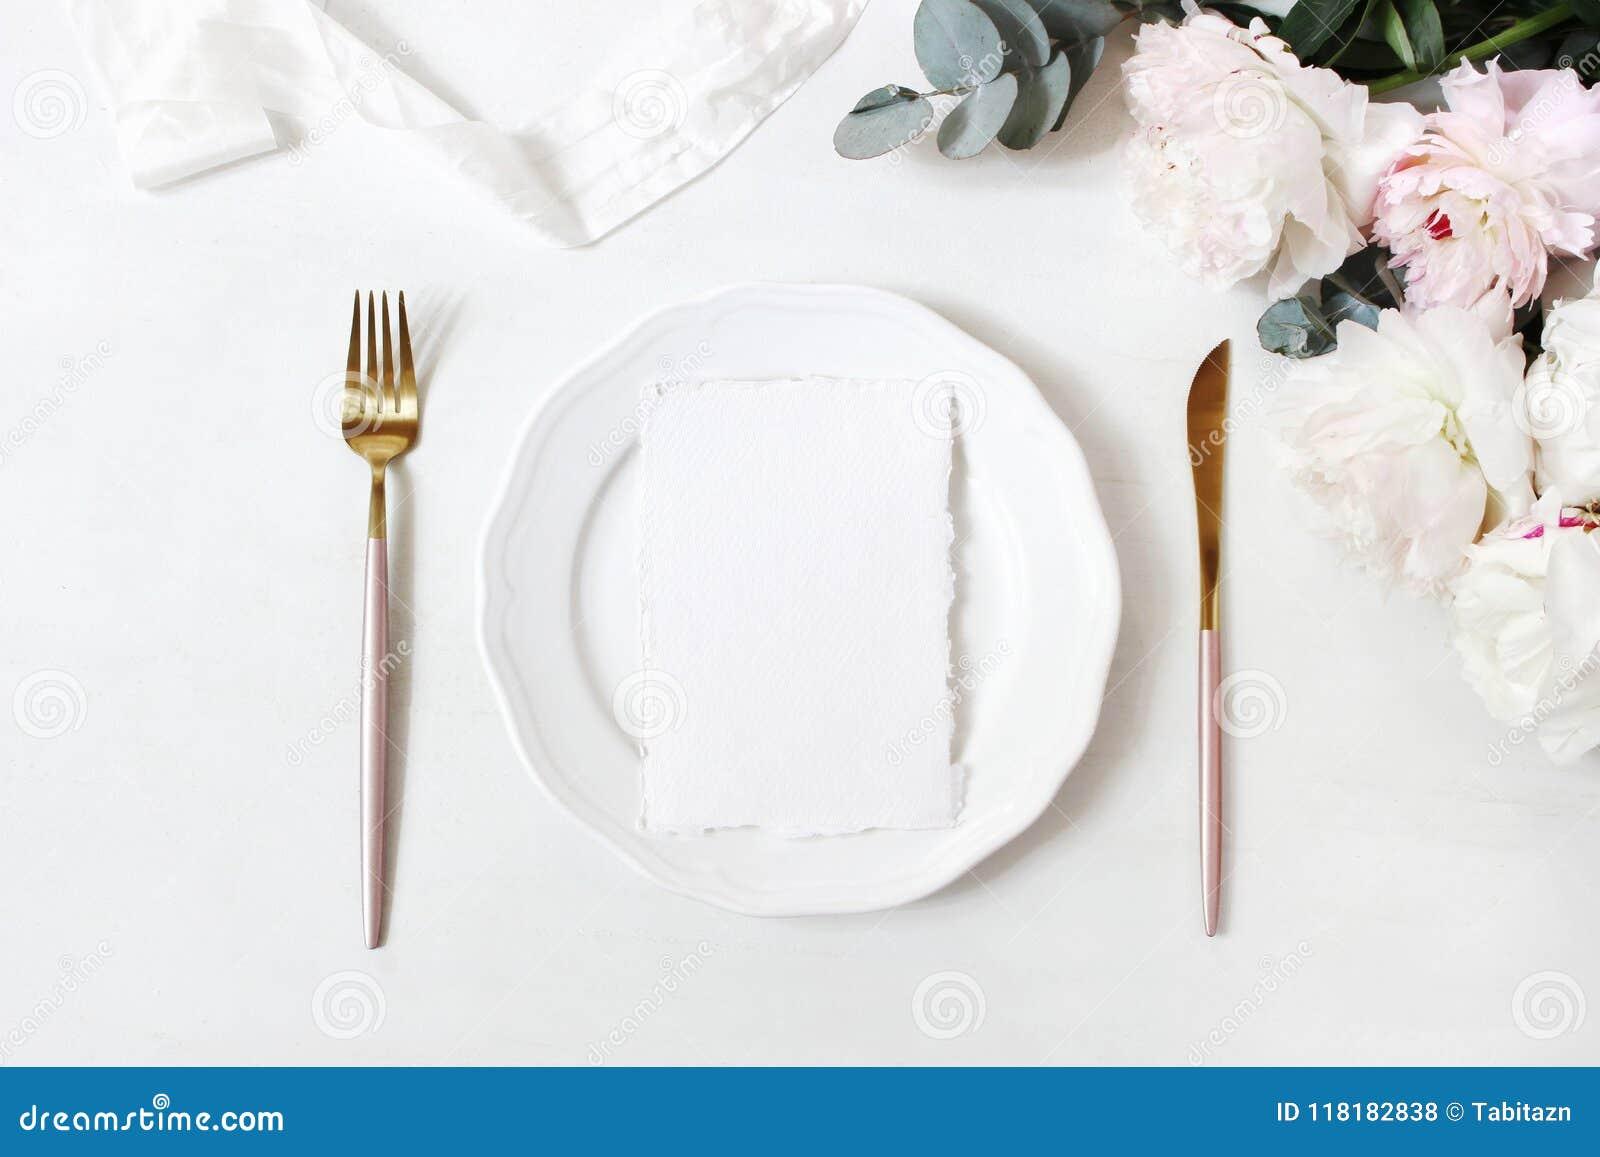 Feminine wedding, birthday desktop mock-up scene. Porcelain plate, blank craft paper greeting cards, silk ribbon, golden